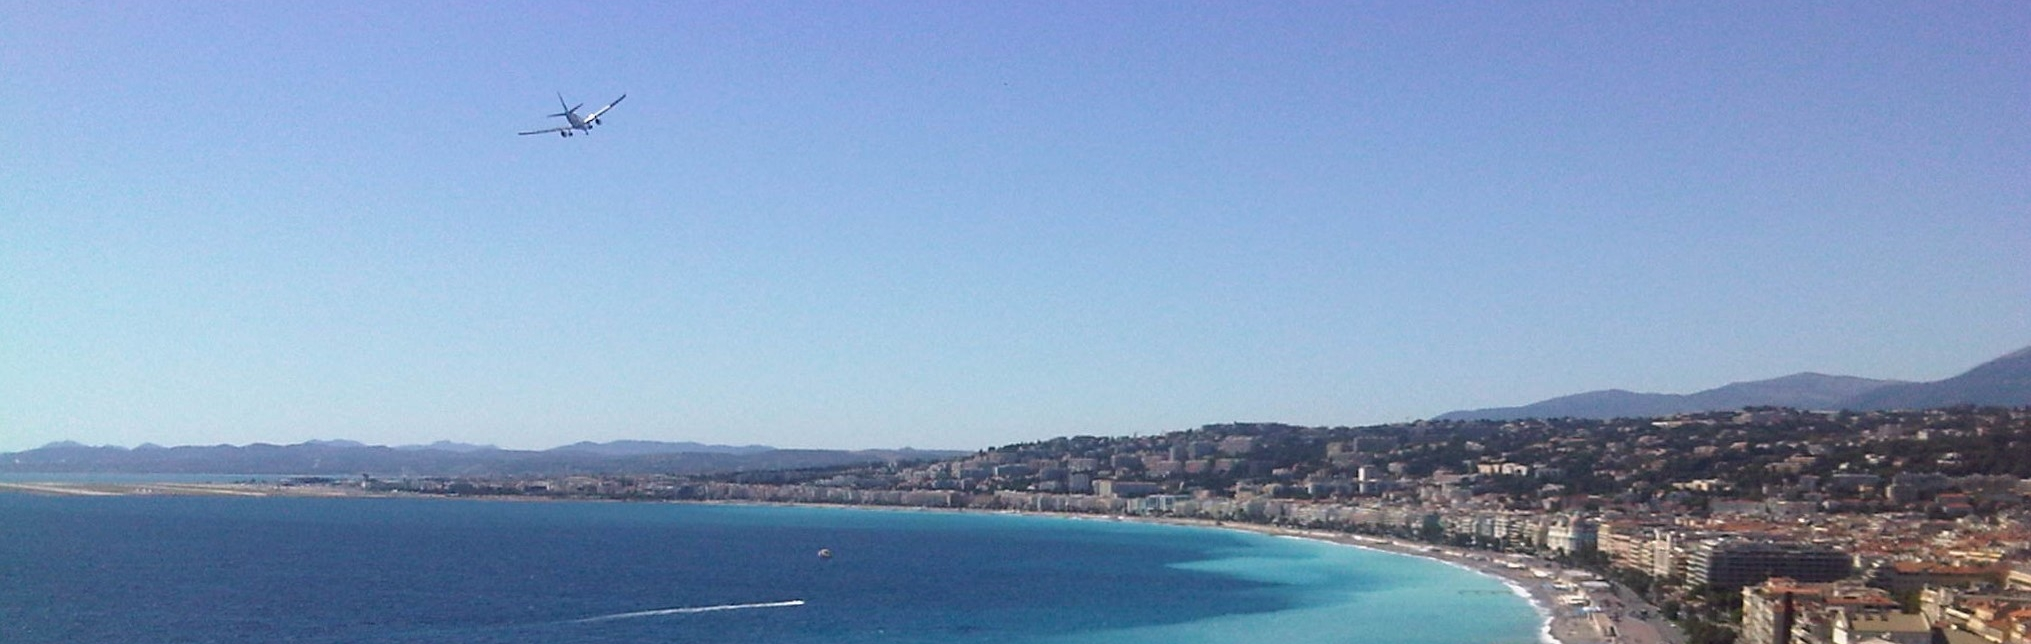 Baie de Nice #3.jpg